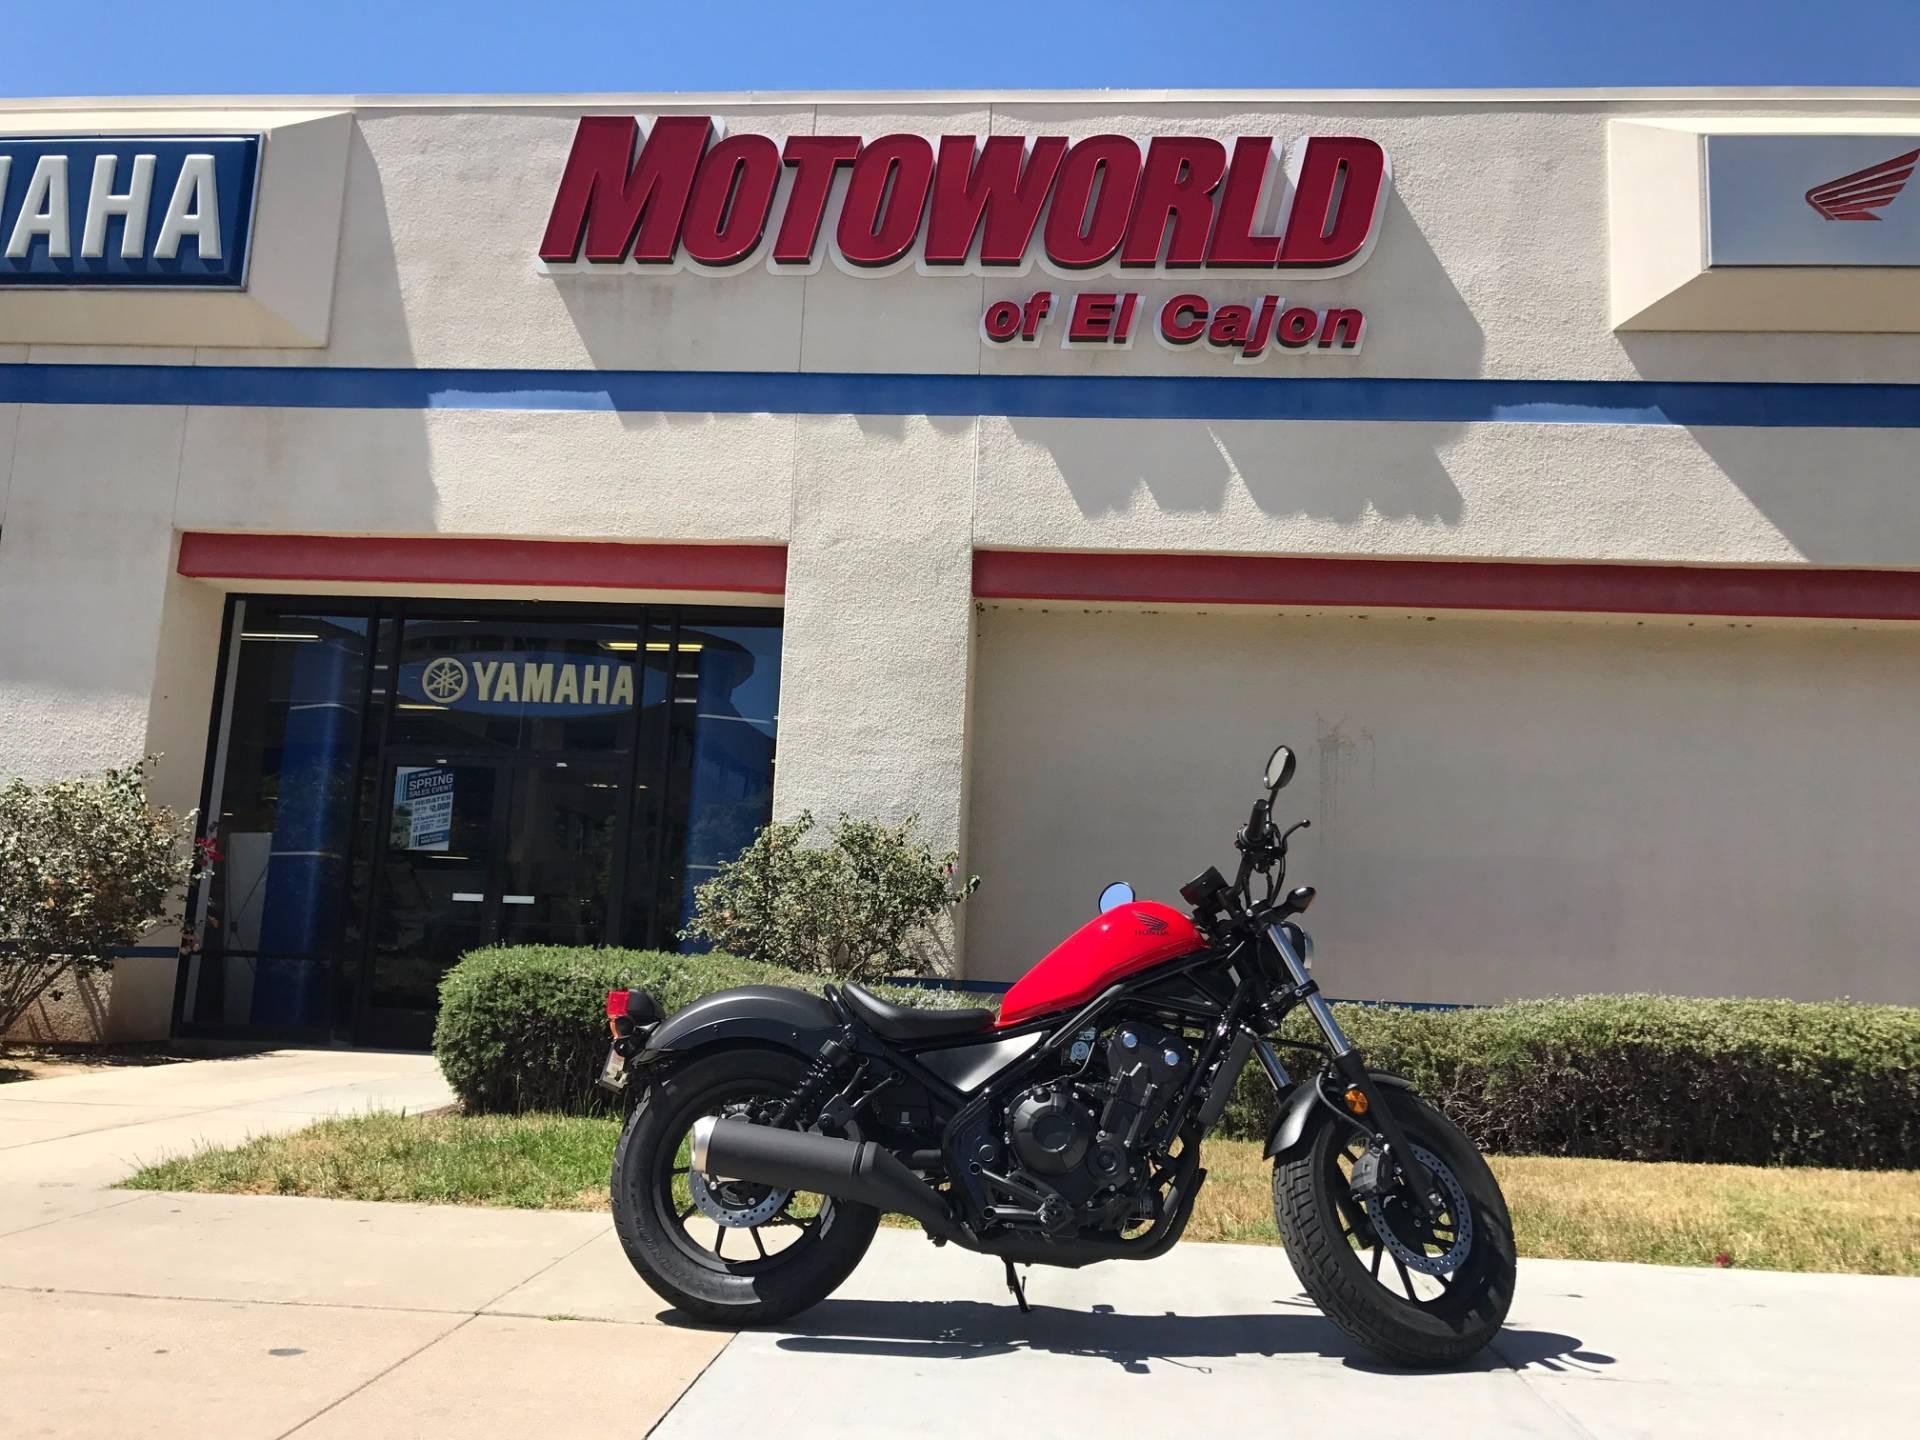 2017 Honda Rebel 500 In EL Cajon, California